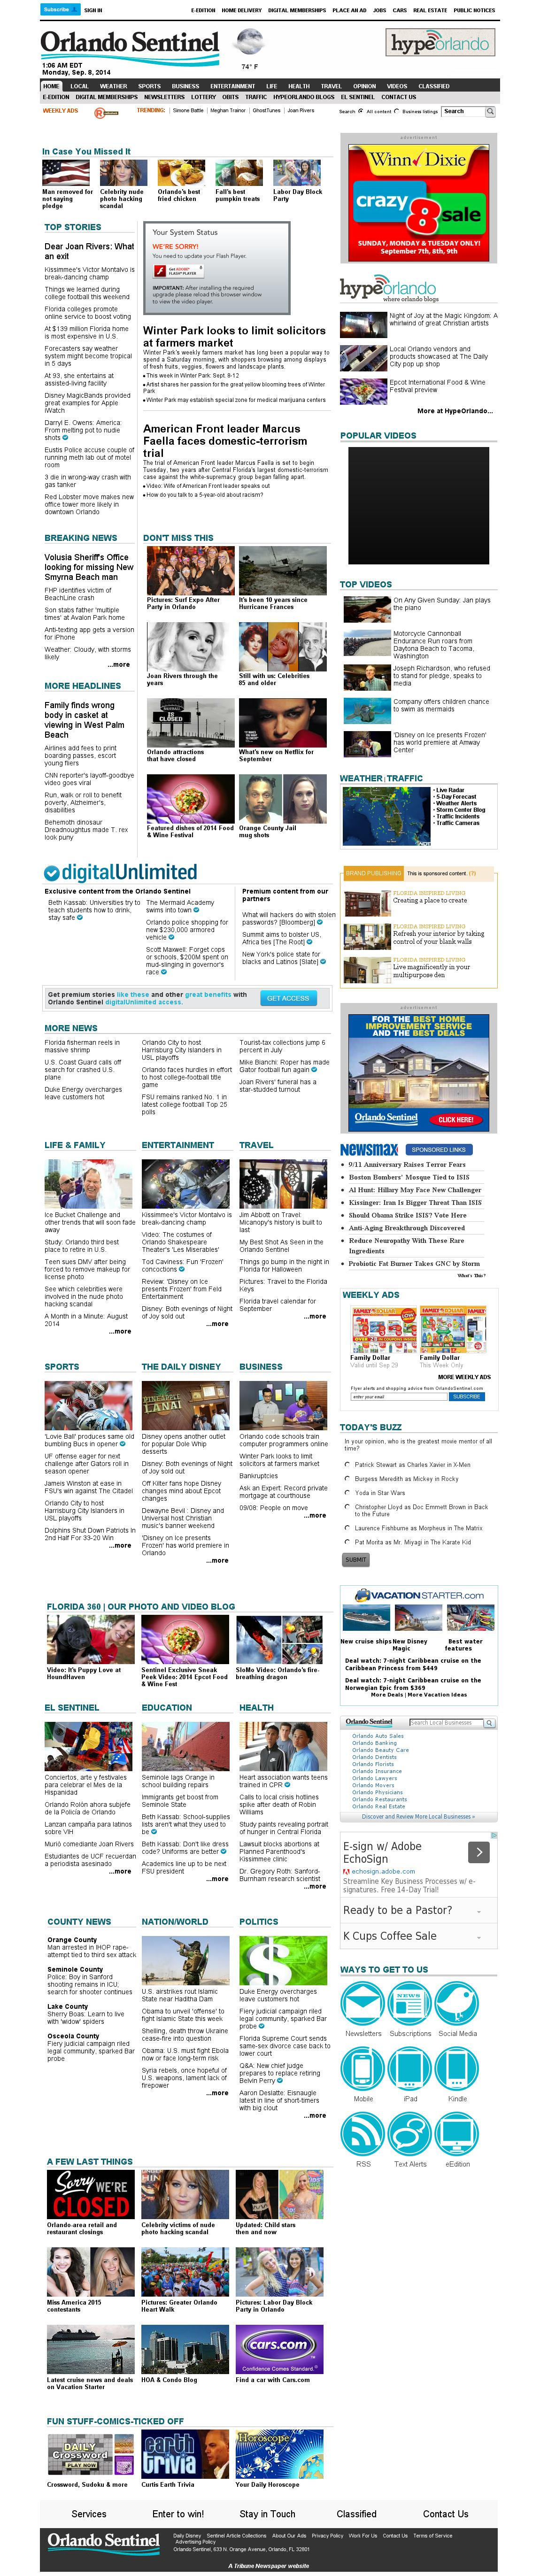 Orlando Sentinel at Monday Sept. 8, 2014, 5:12 a.m. UTC